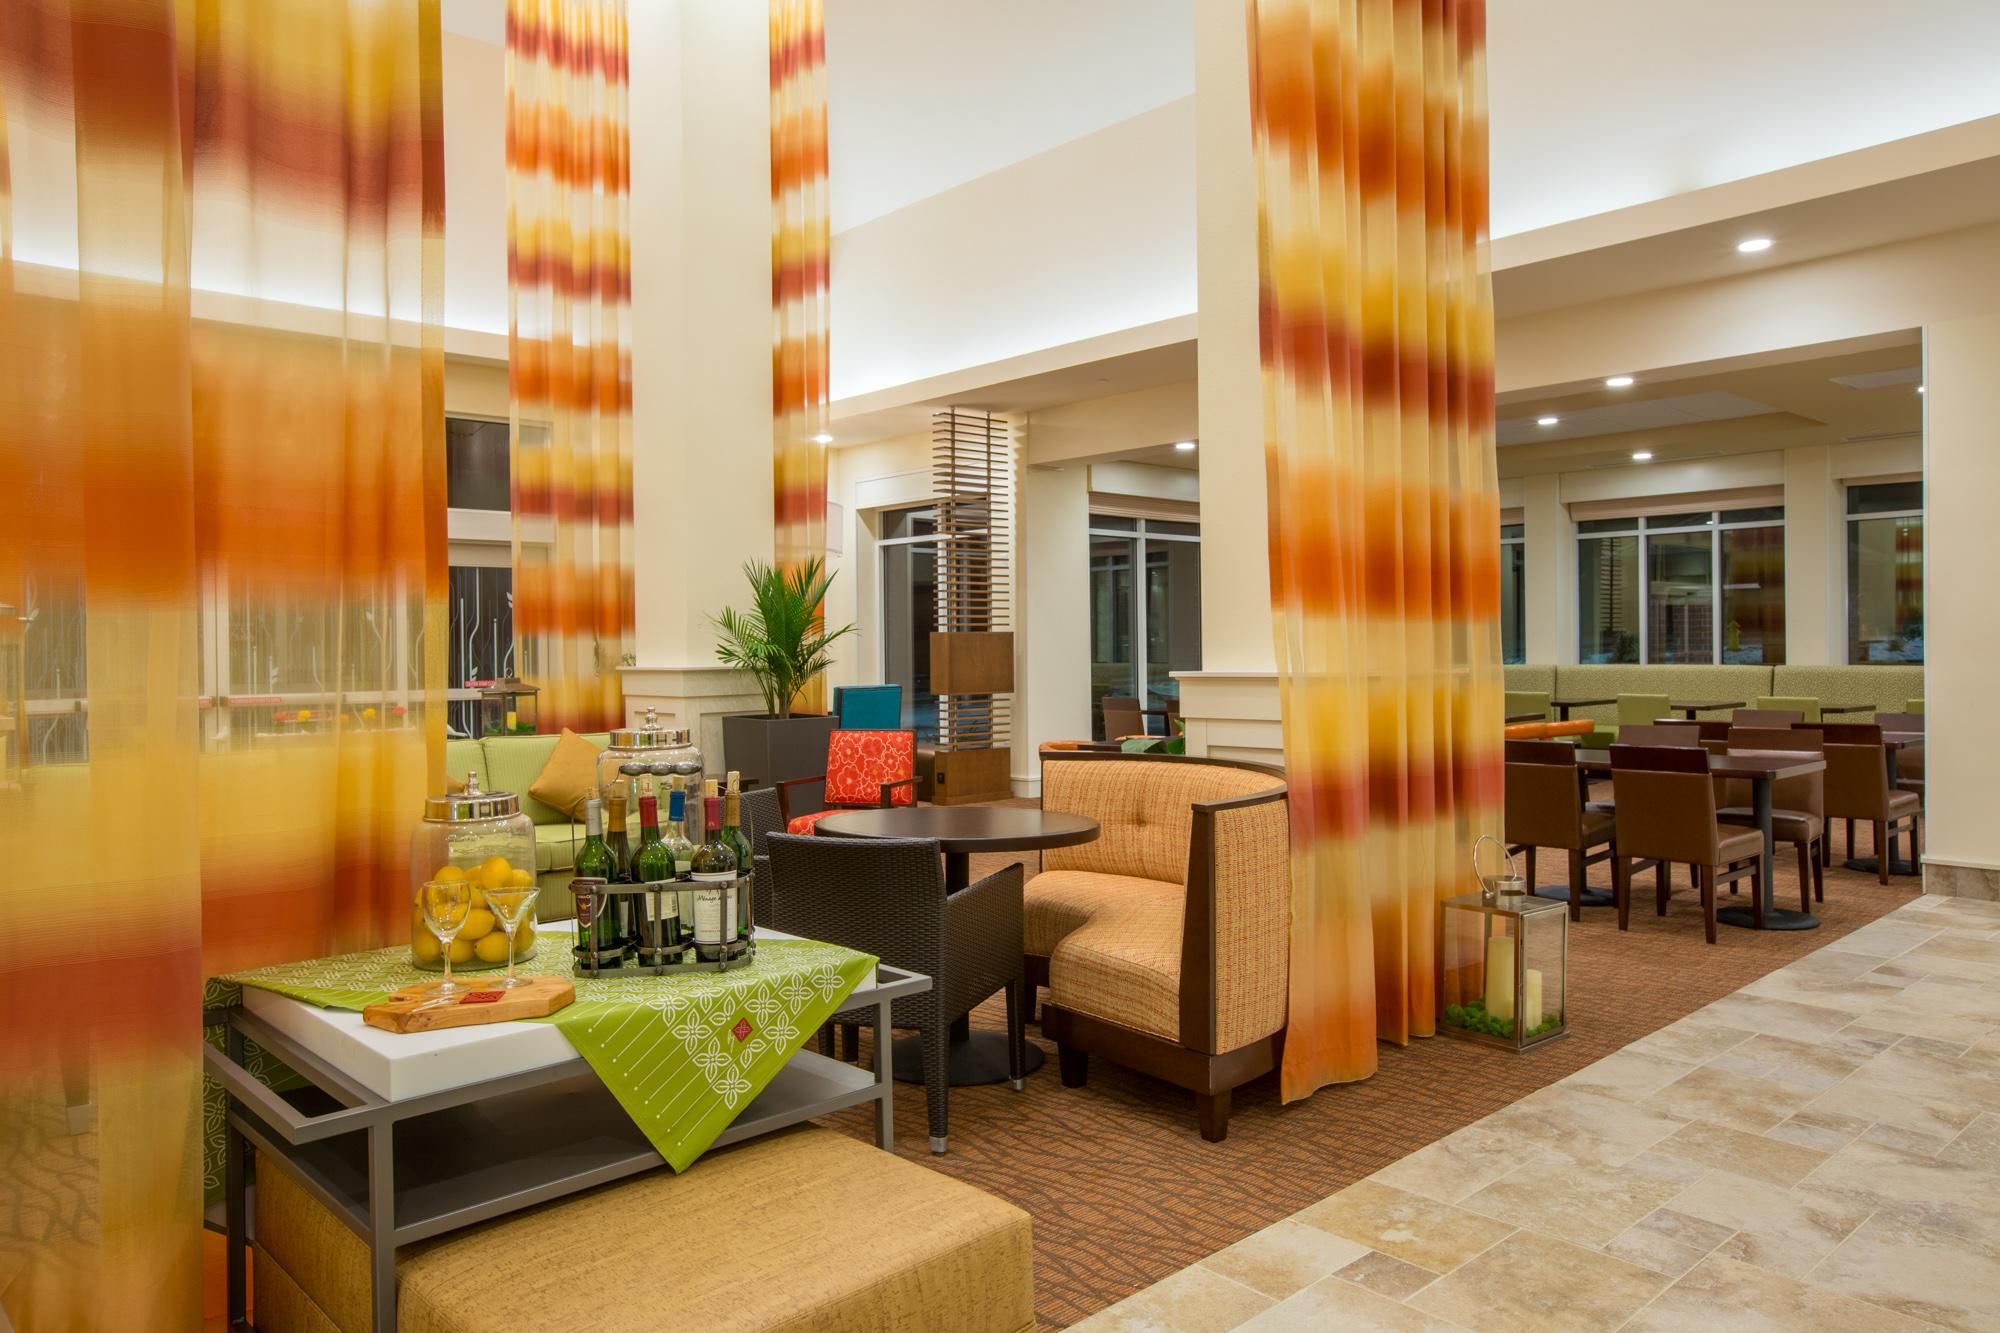 Hilton Garden Inn Olympia Olympia Washington Wa